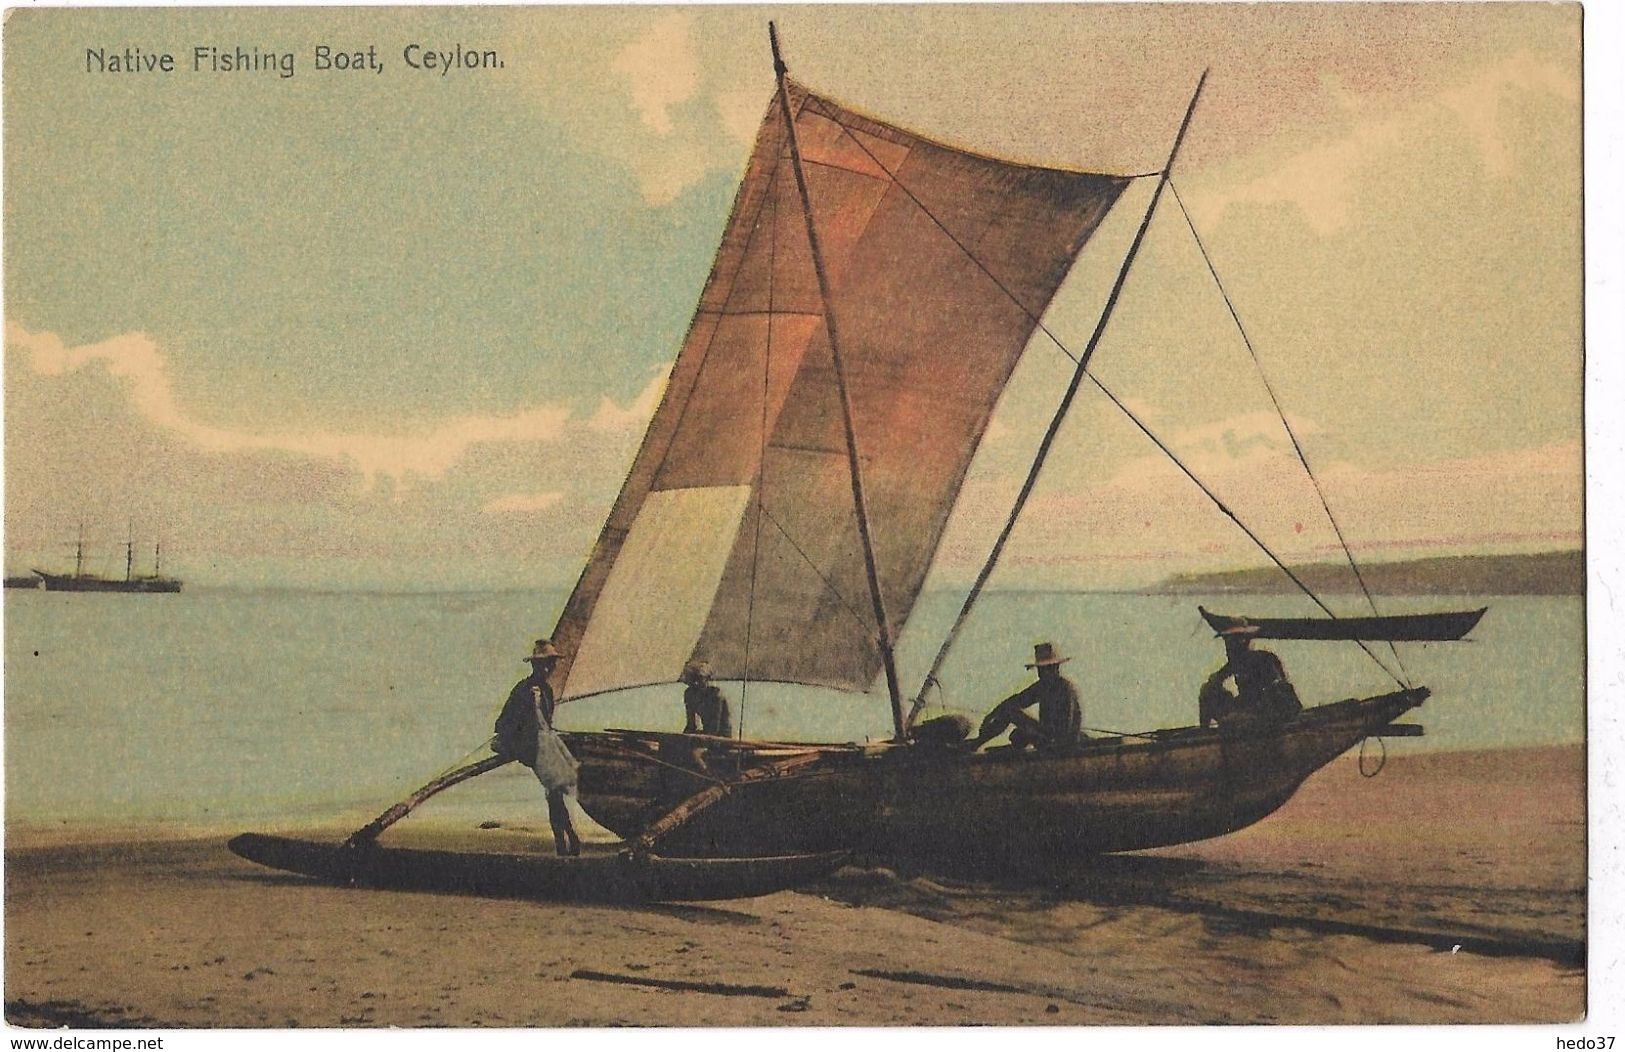 Native Fishing Boat, Ceylon - Postcards